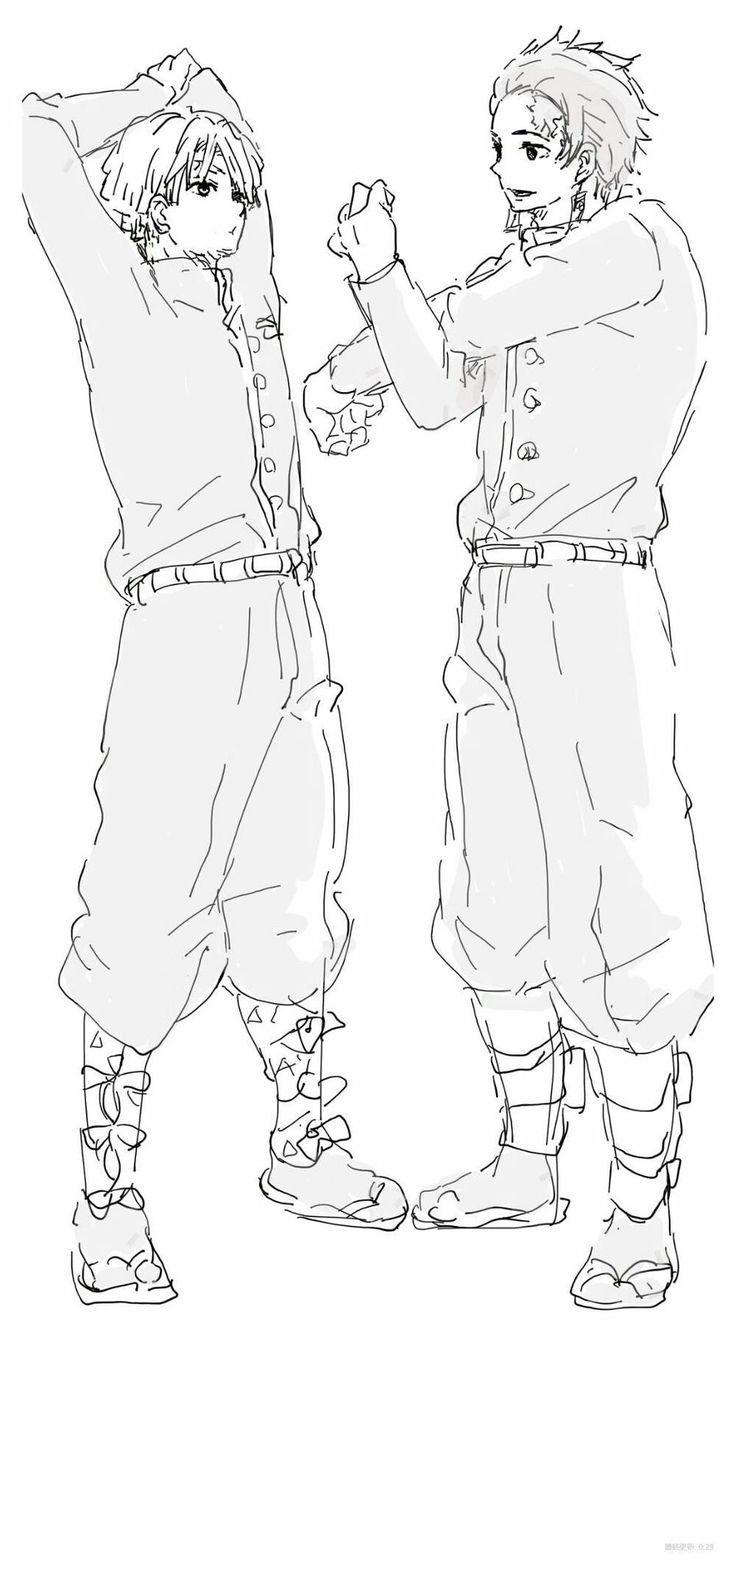 (notitle) – Anime/Manga Bilder